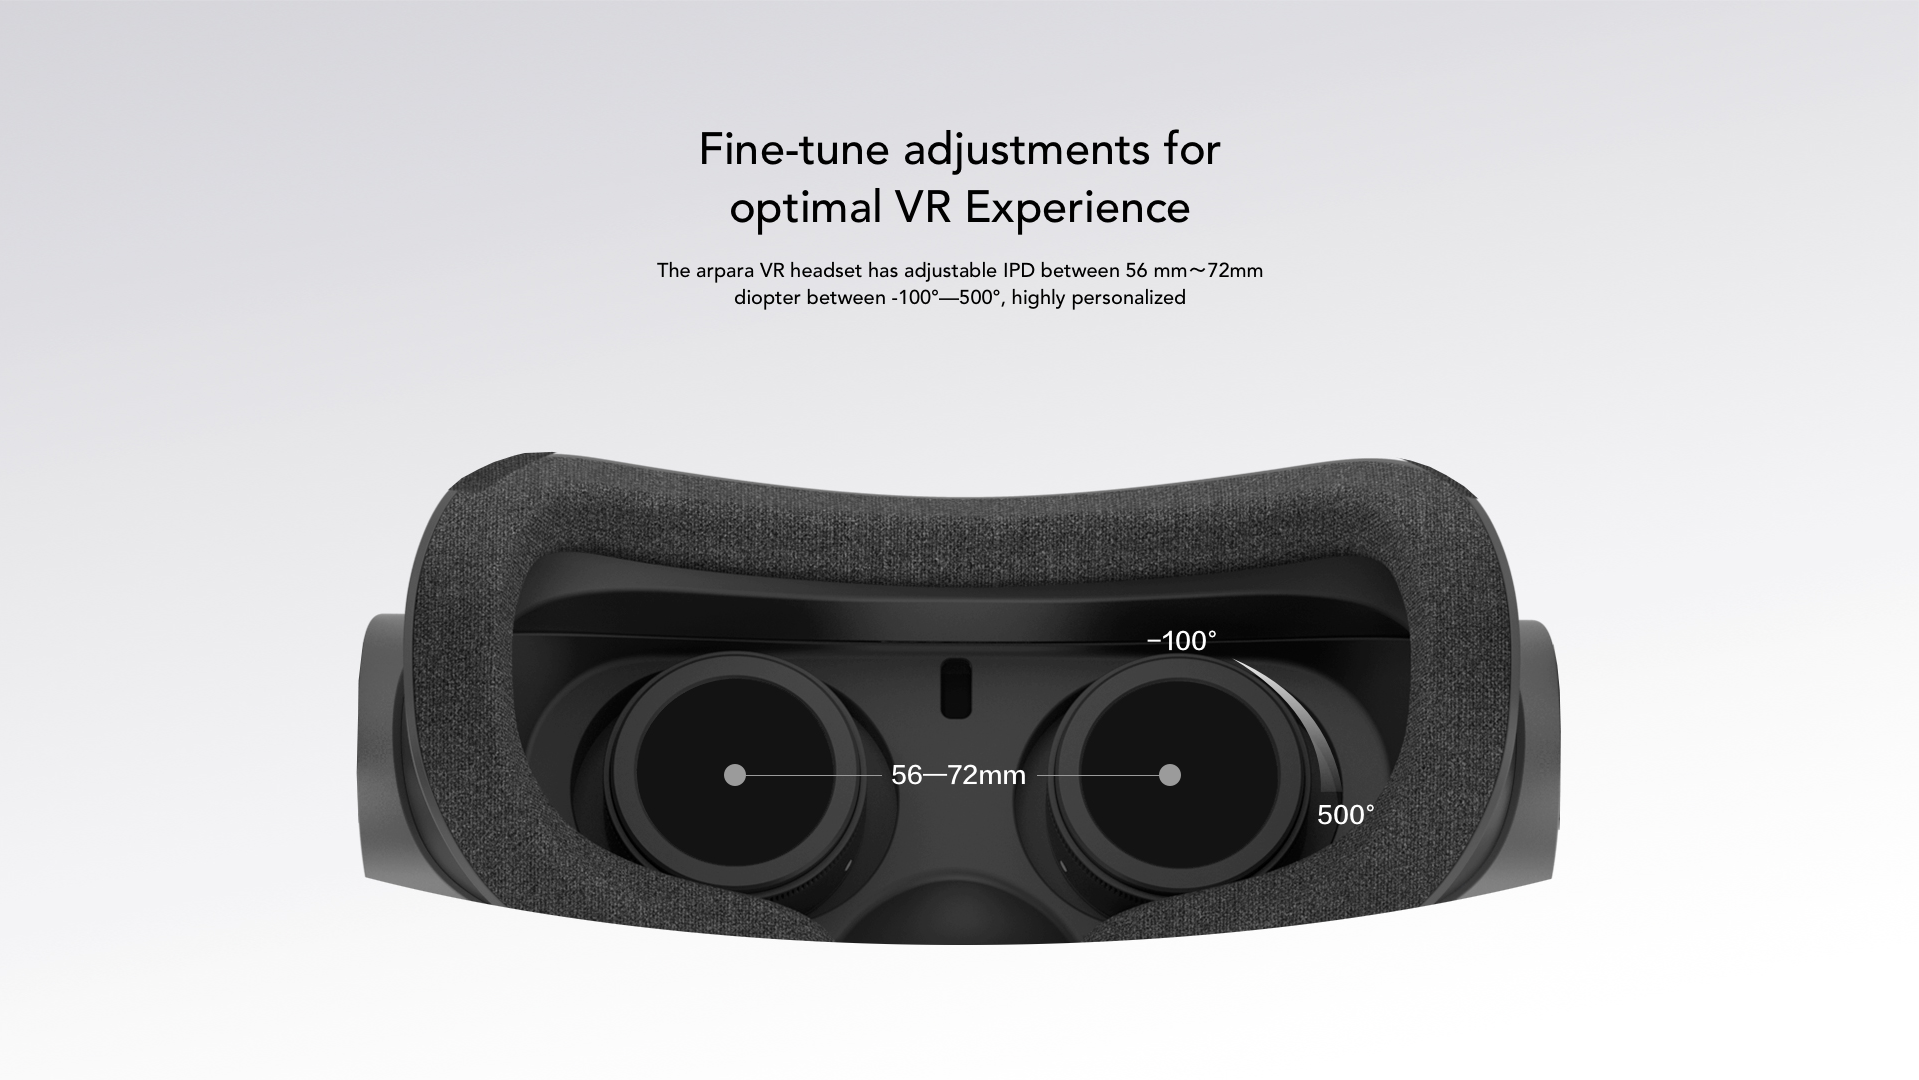 Arpara 5K VR Headset